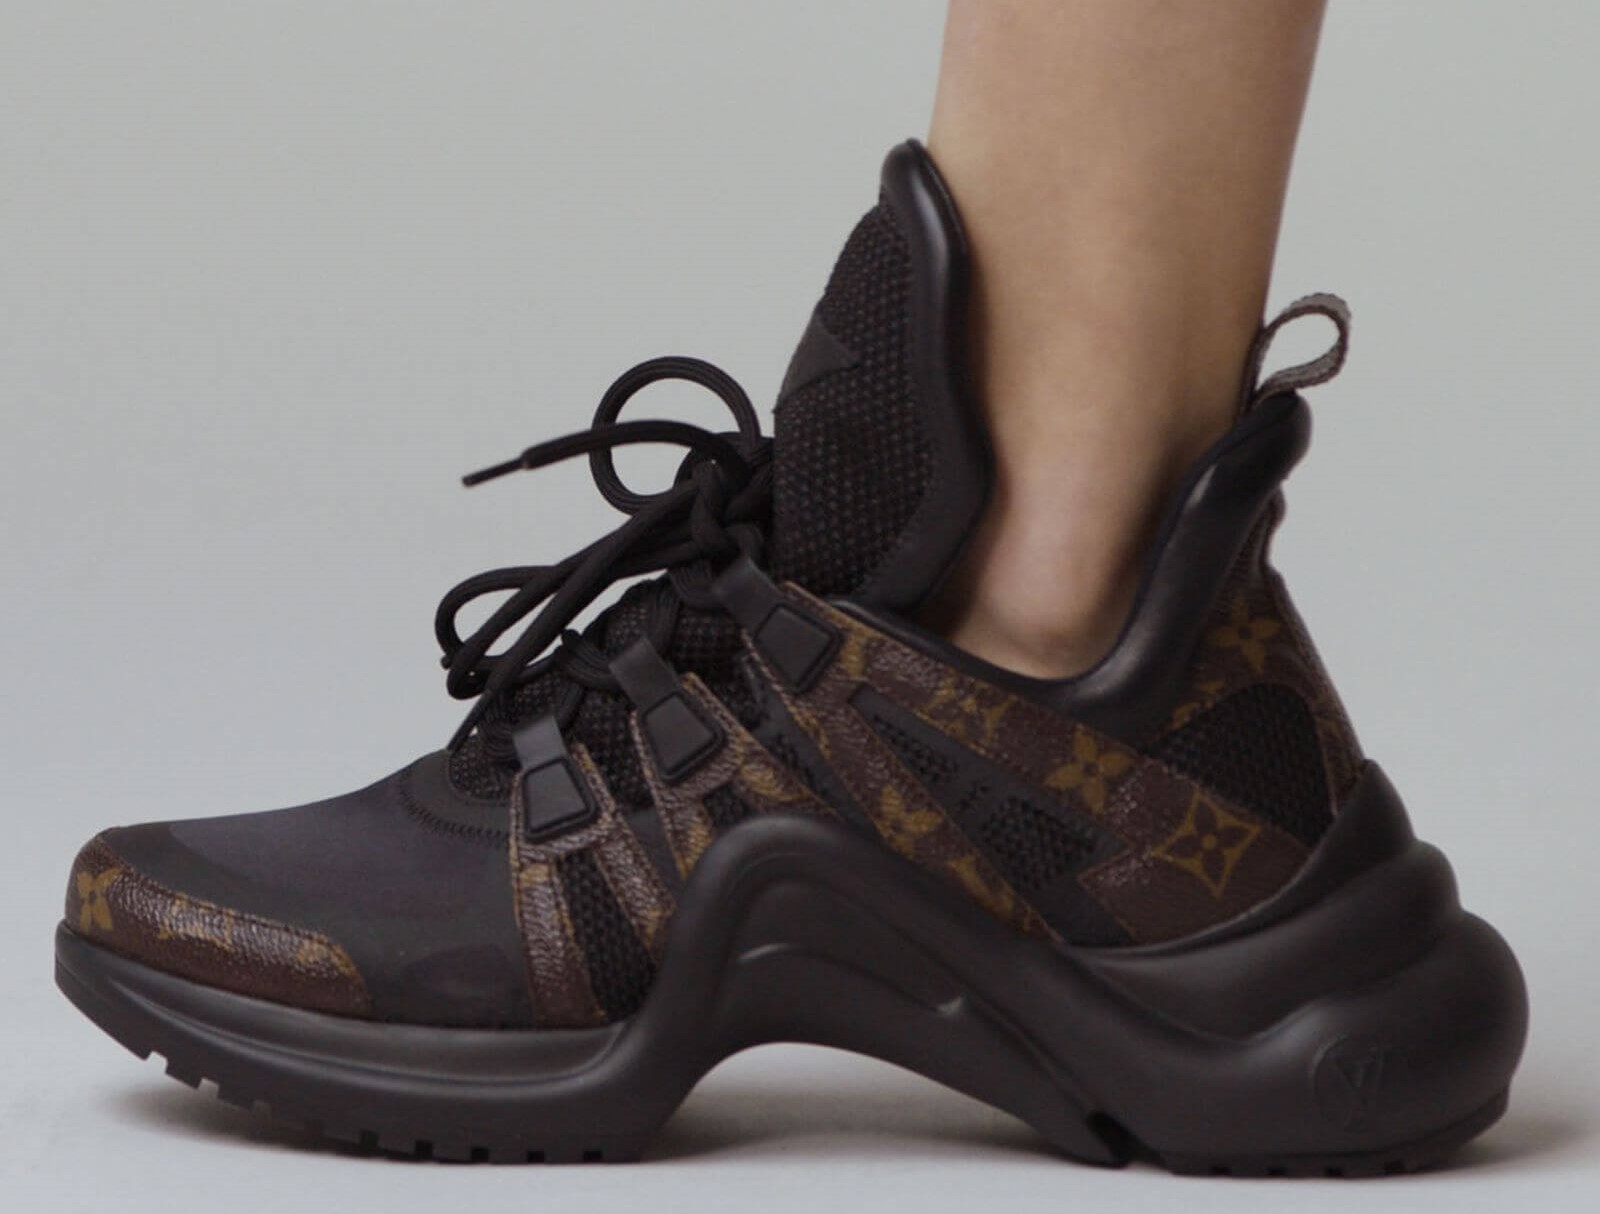 lv-archlight-sneaker